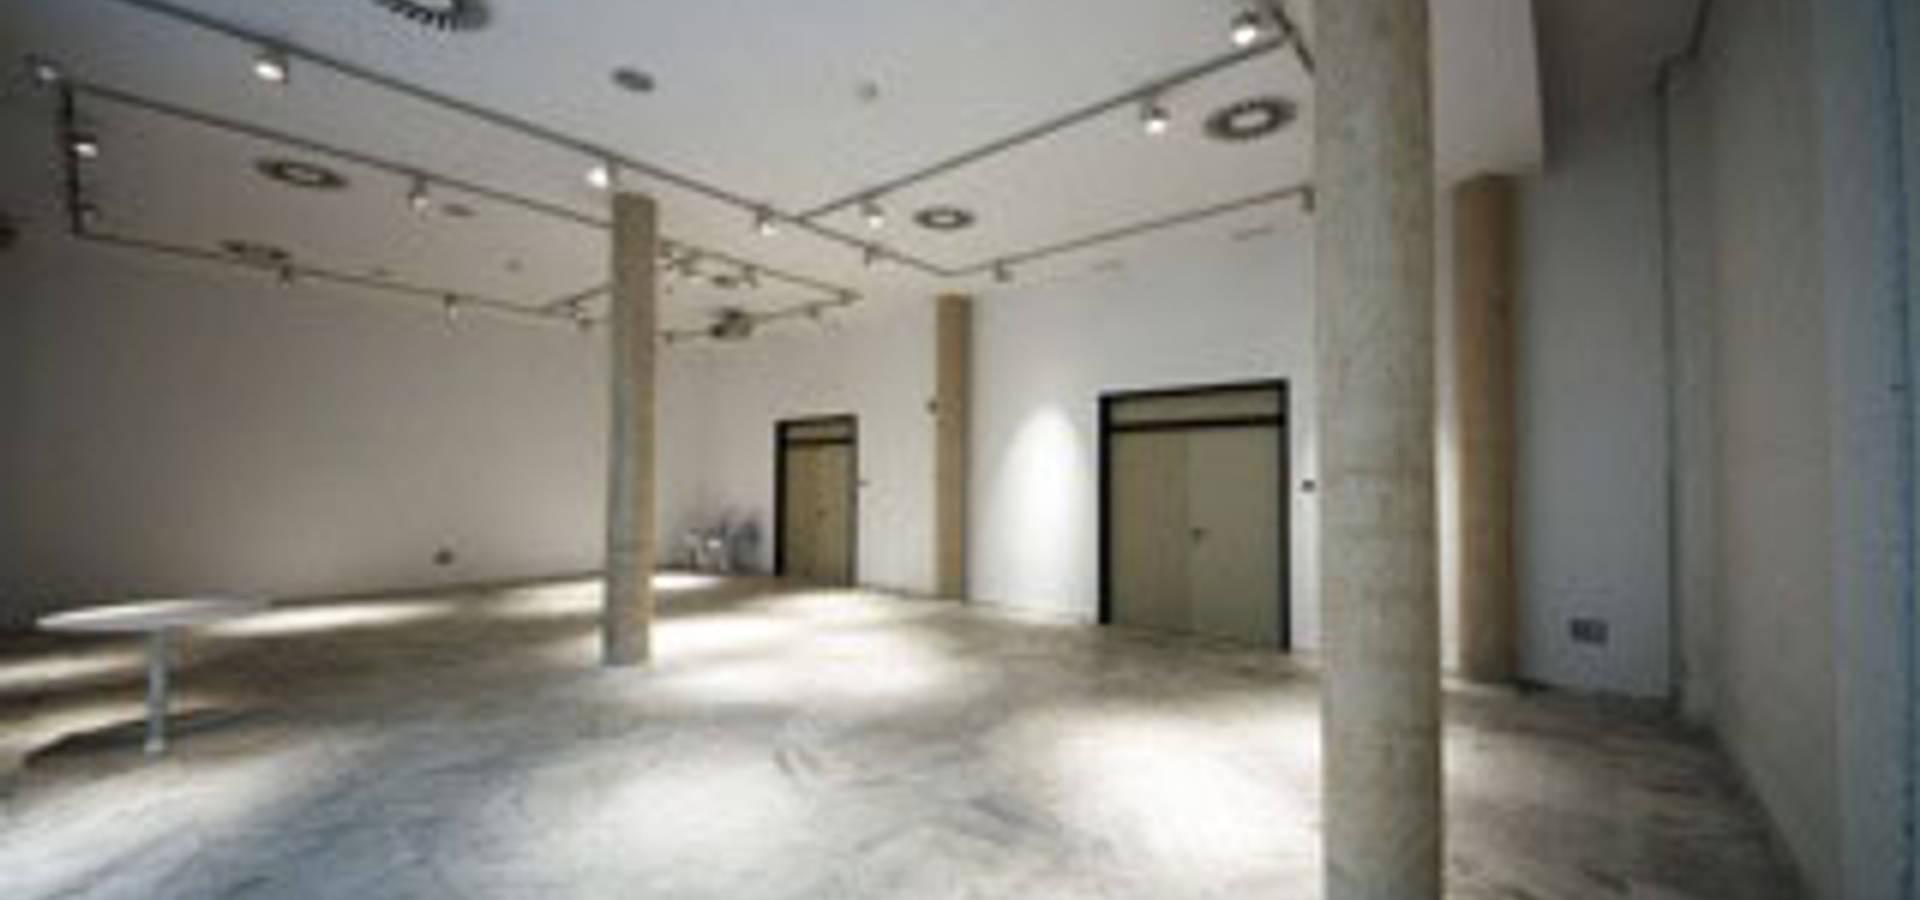 Gomez-Ferrer arquitectos